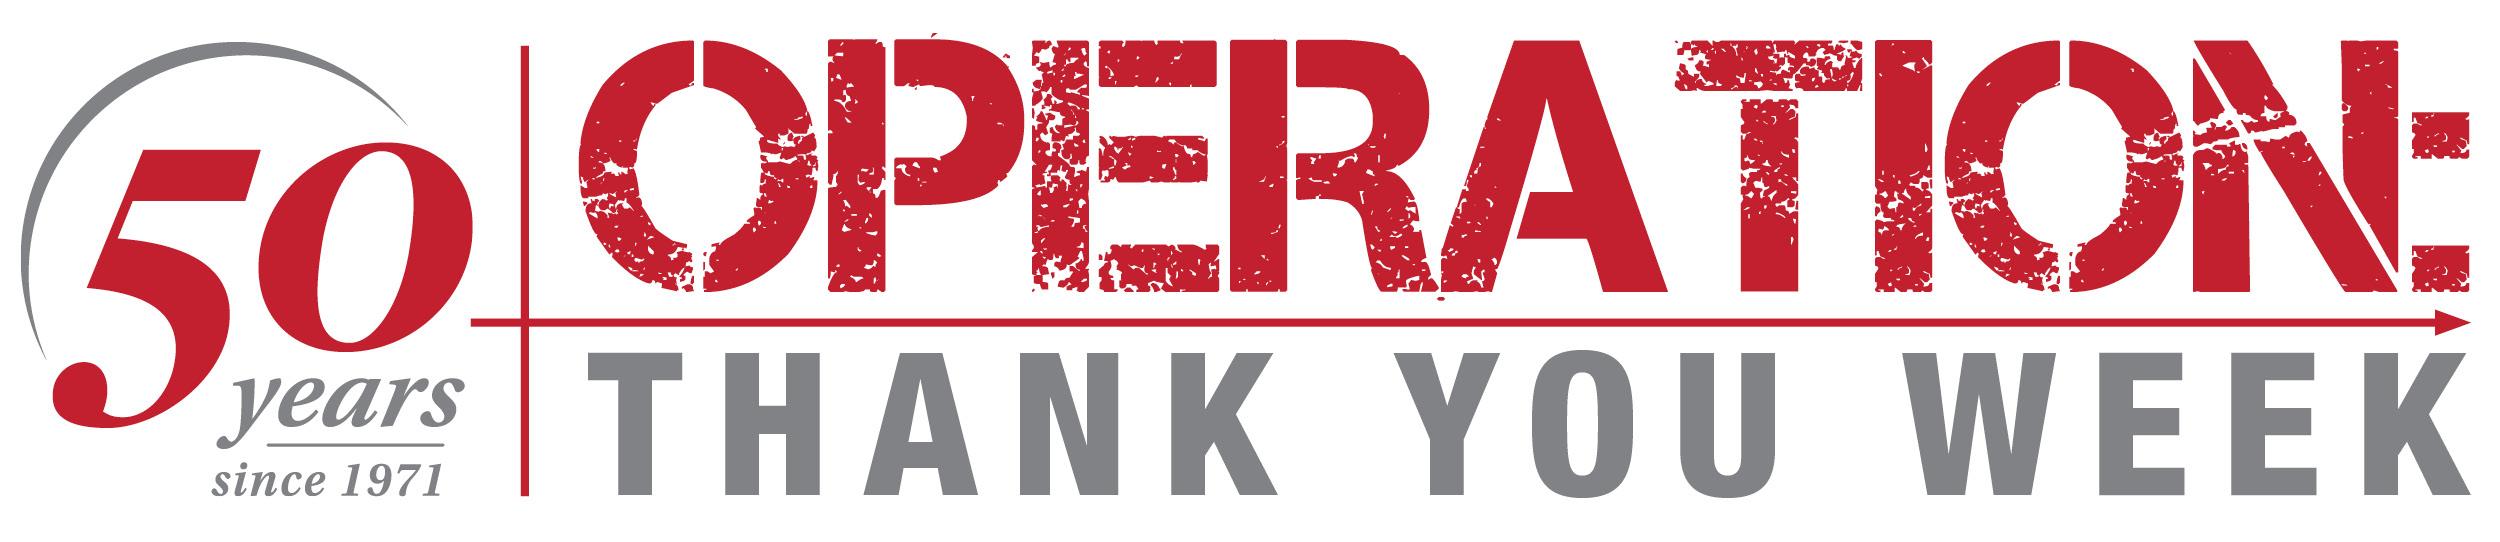 operation thank you week wordmark